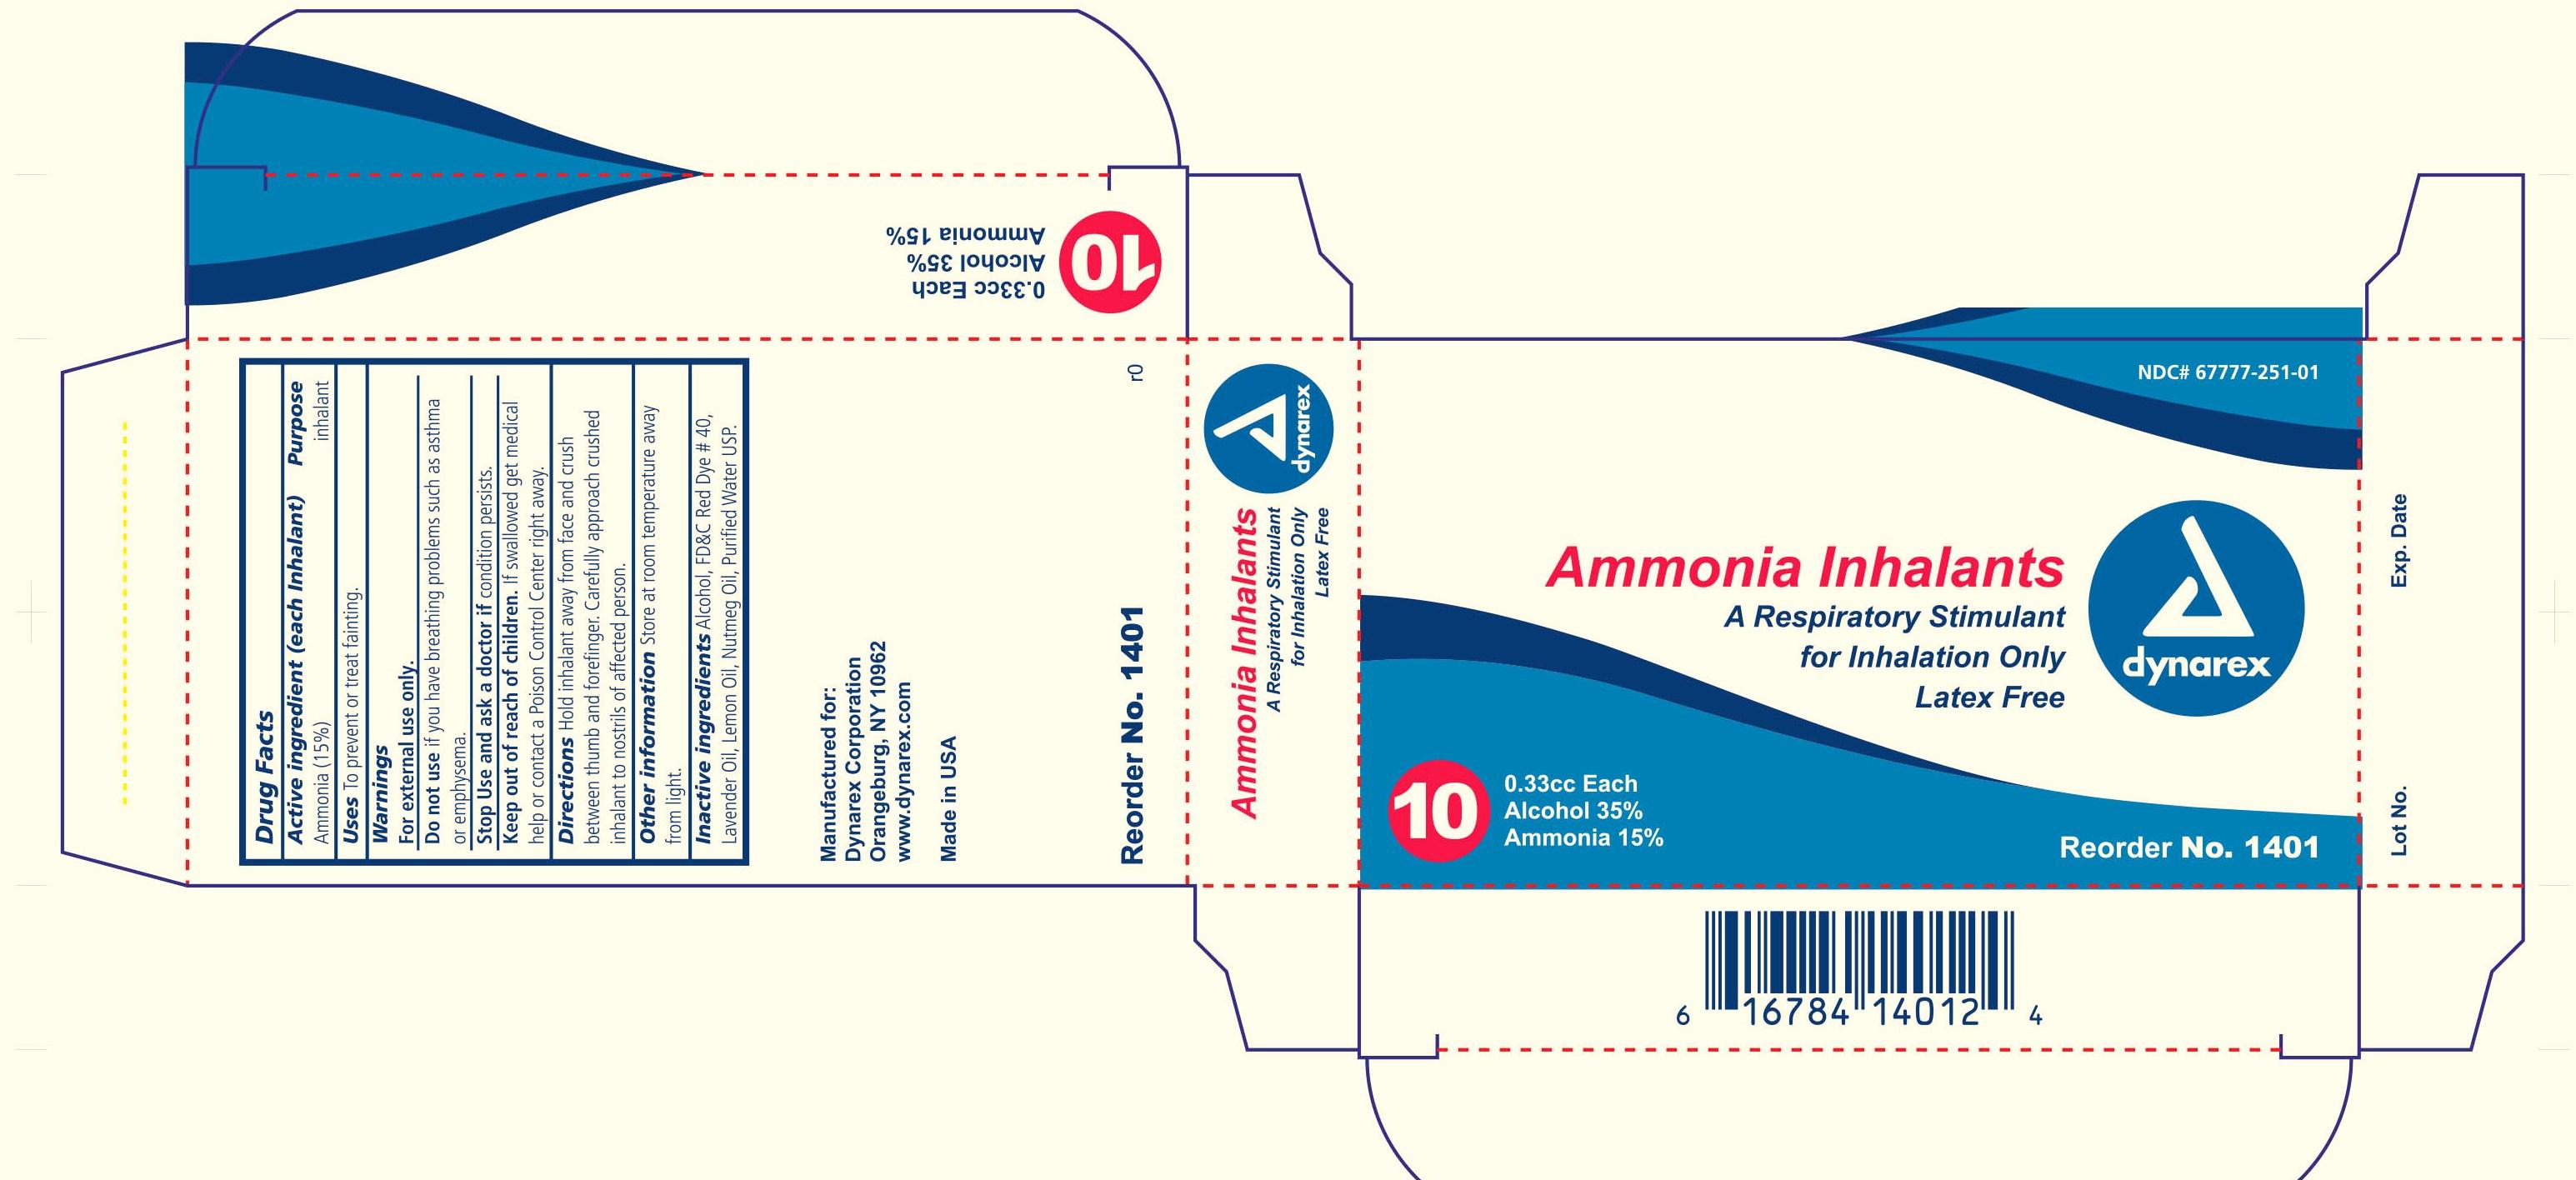 Ammonia Inhalants Inhalant [Dynarex Corporation]